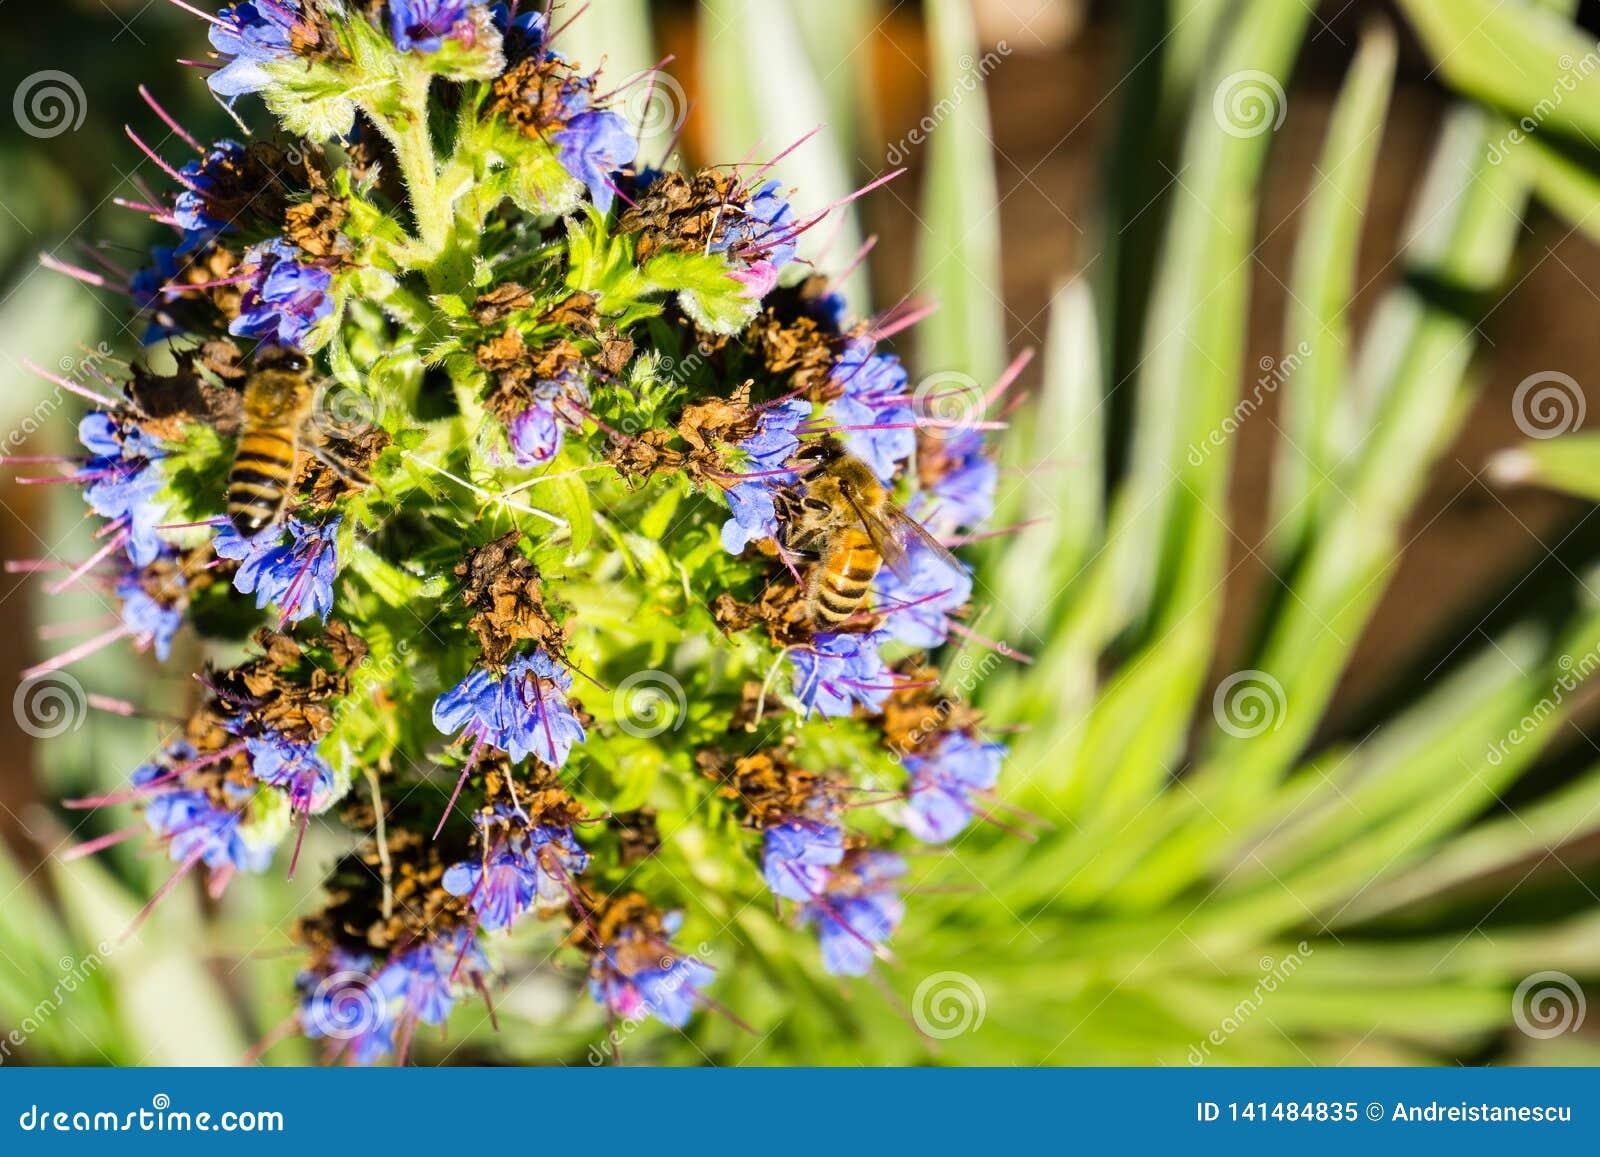 Pszczoły Anthophila na dumie madery Echium Candicans kwiat, Kalifornia